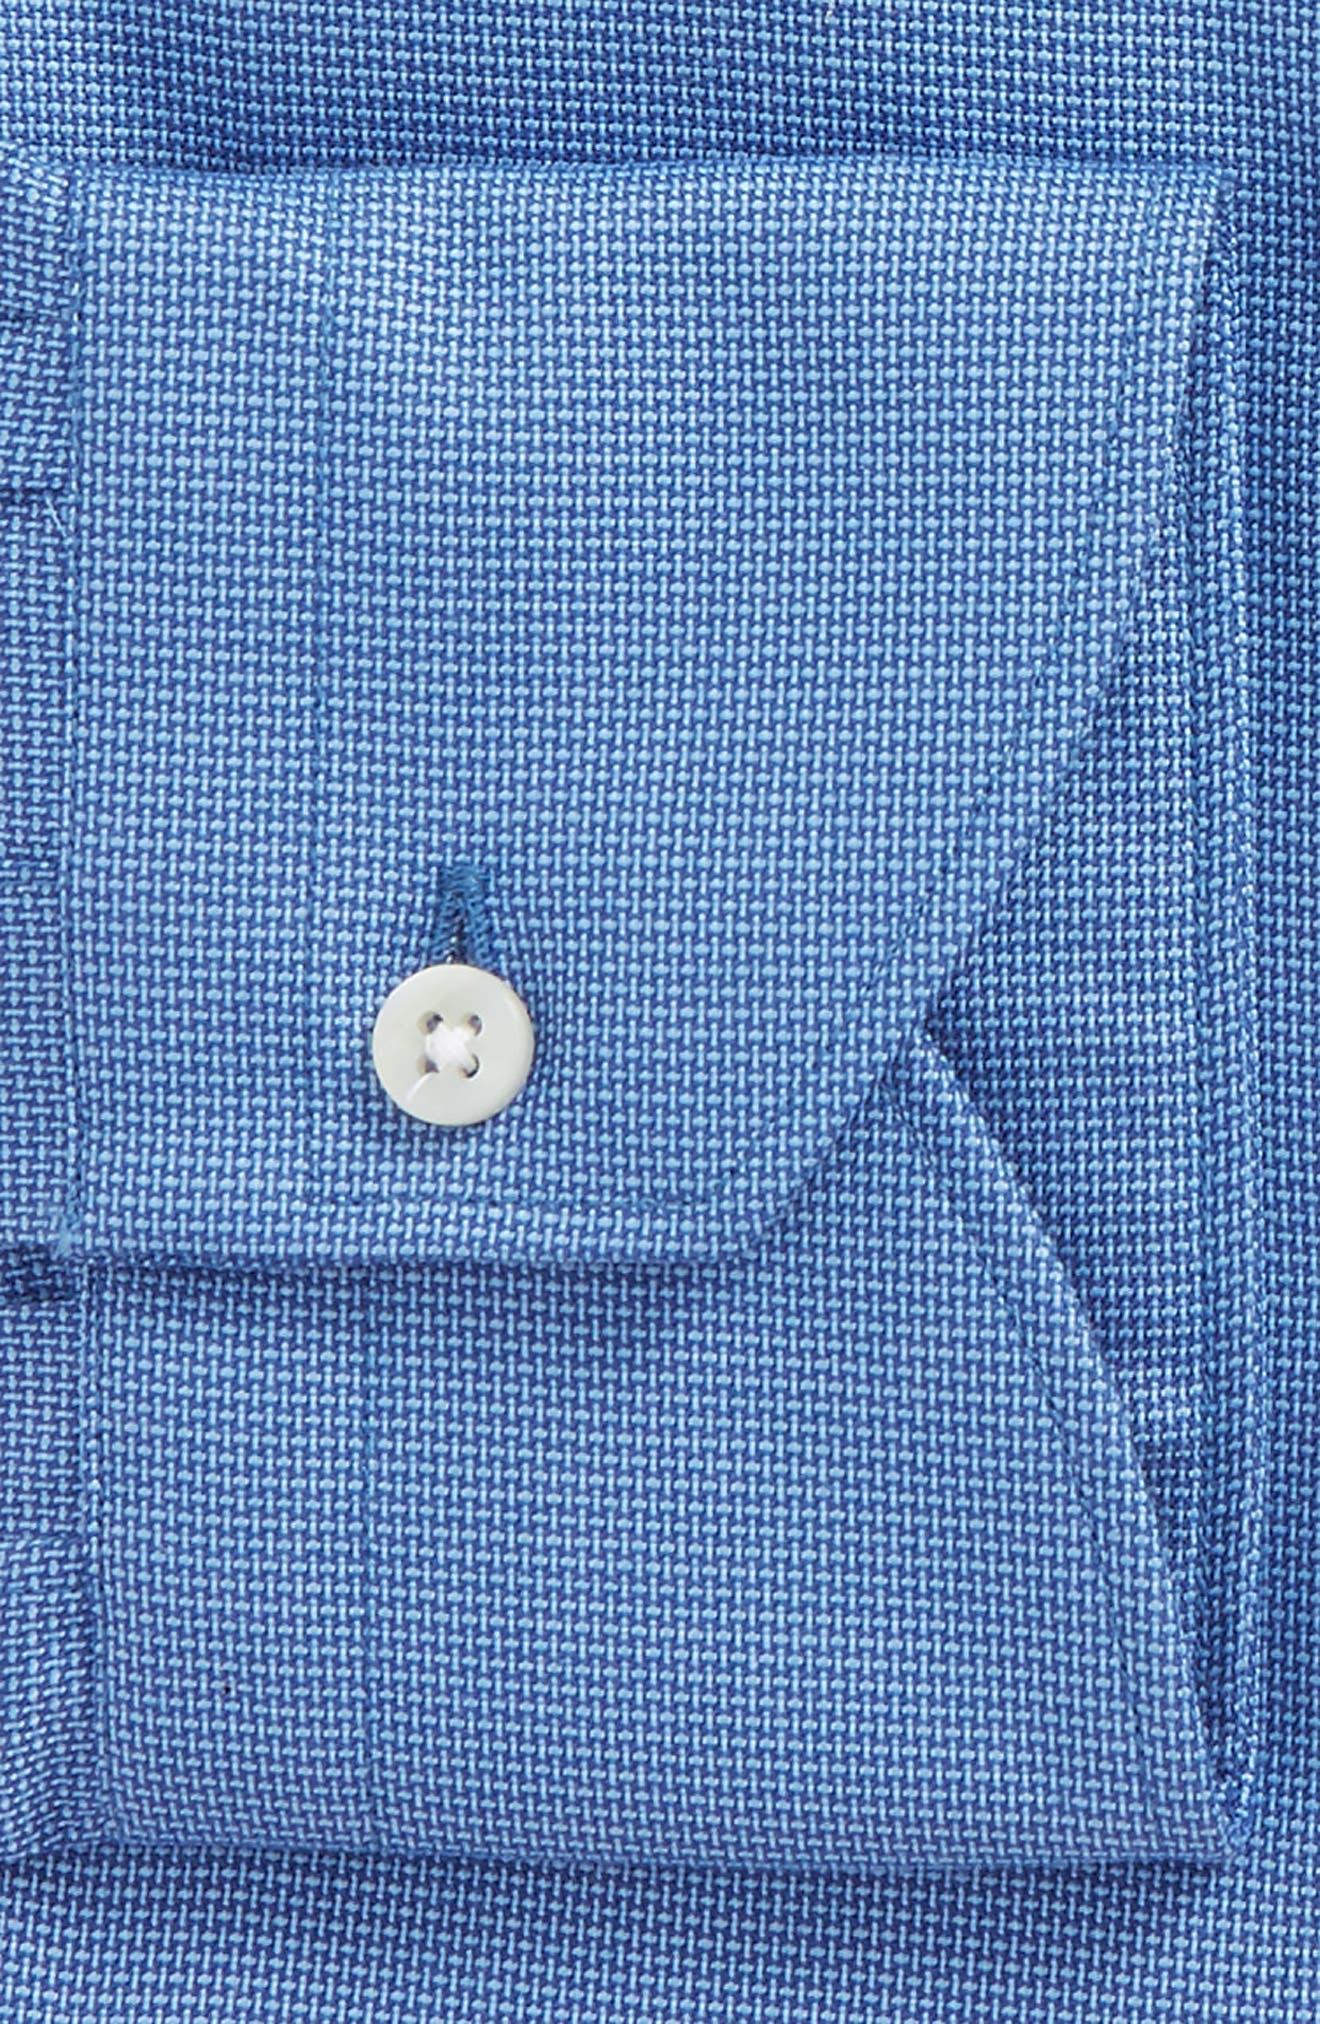 Regular Fit Solid Dress Shirt,                             Alternate thumbnail 2, color,                             400